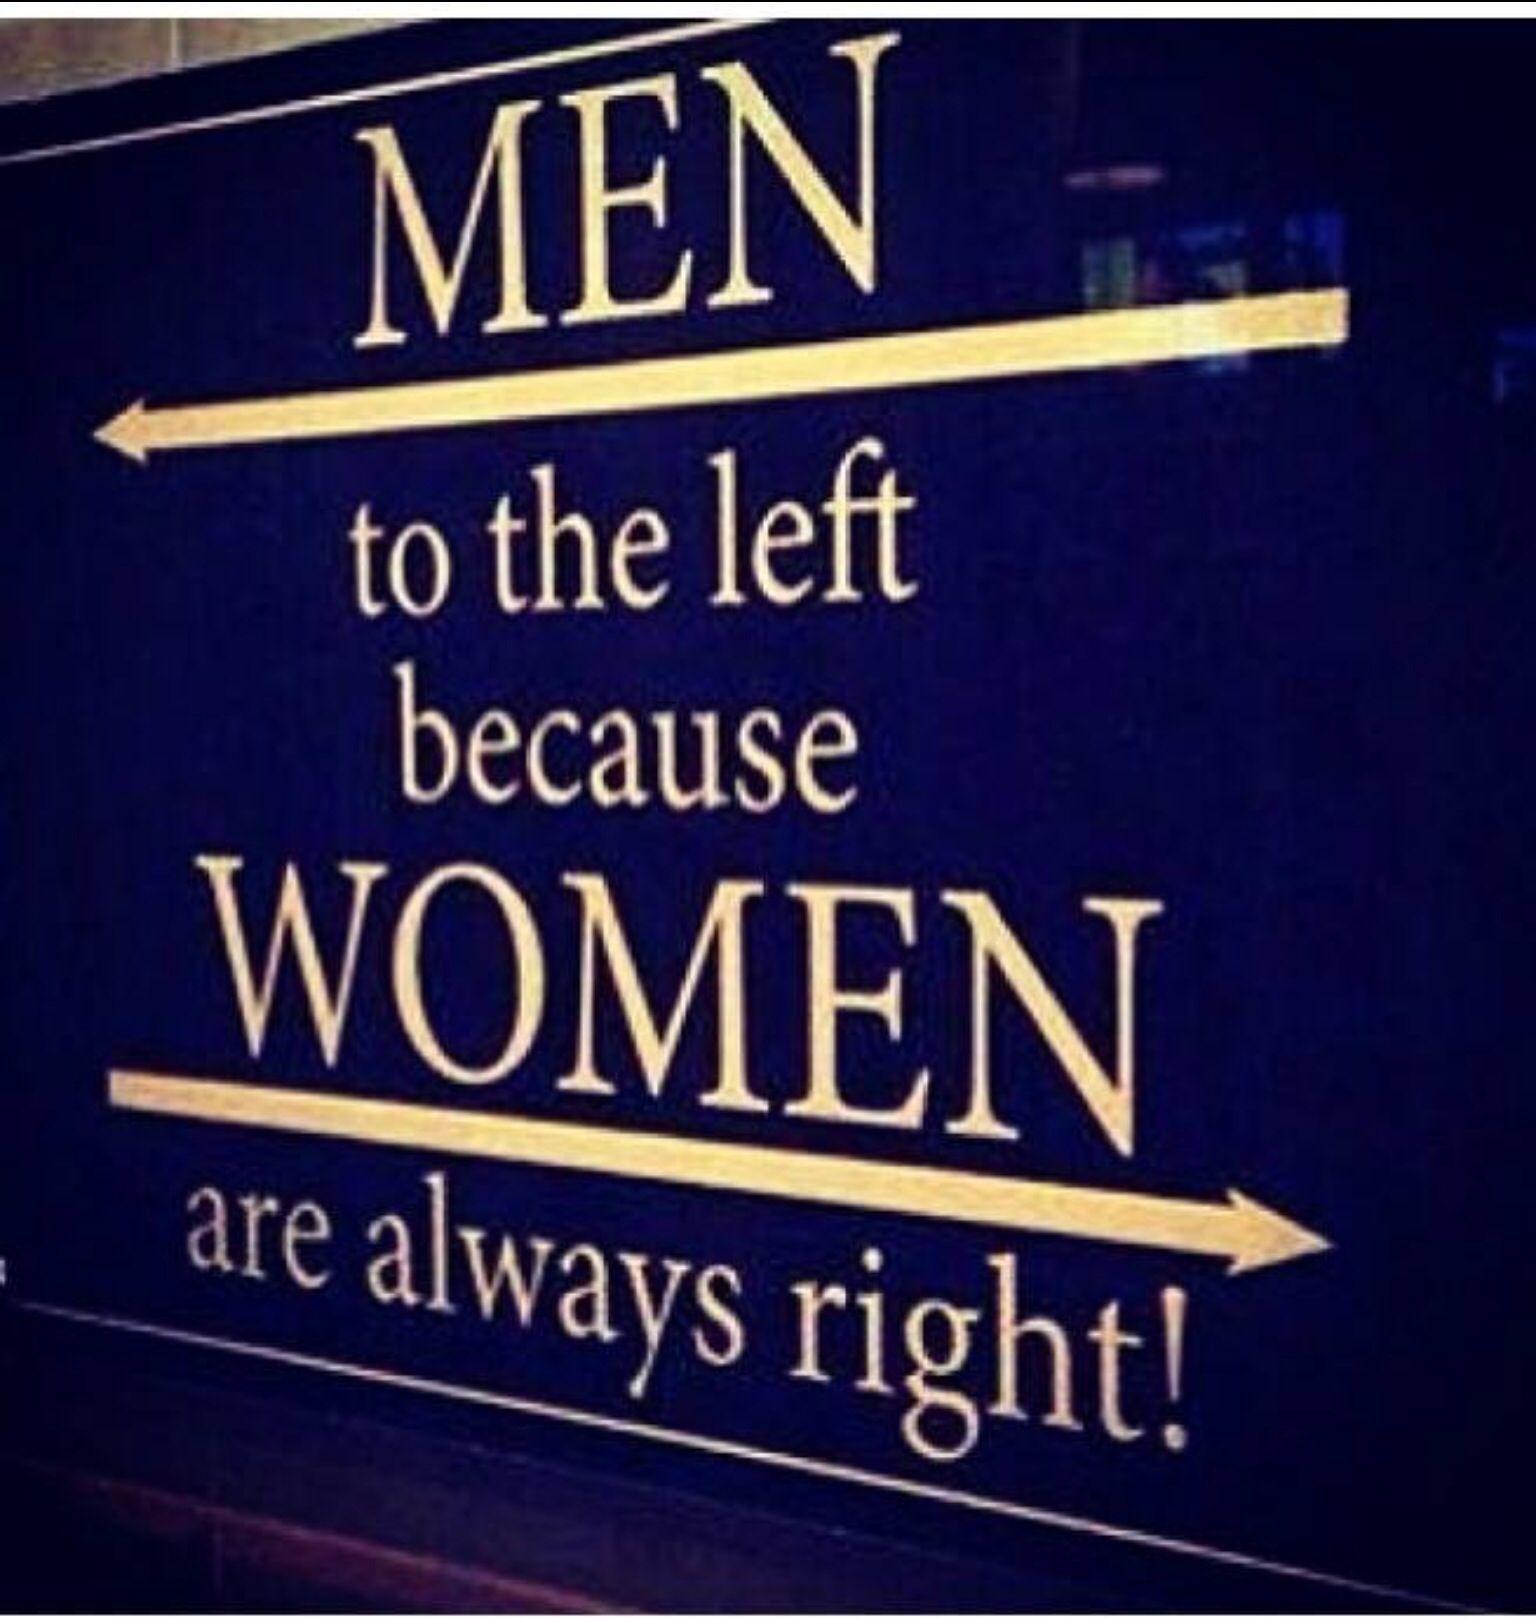 Men Vs Women Funny Quotes: Women Are Always Right Quotes. QuotesGram